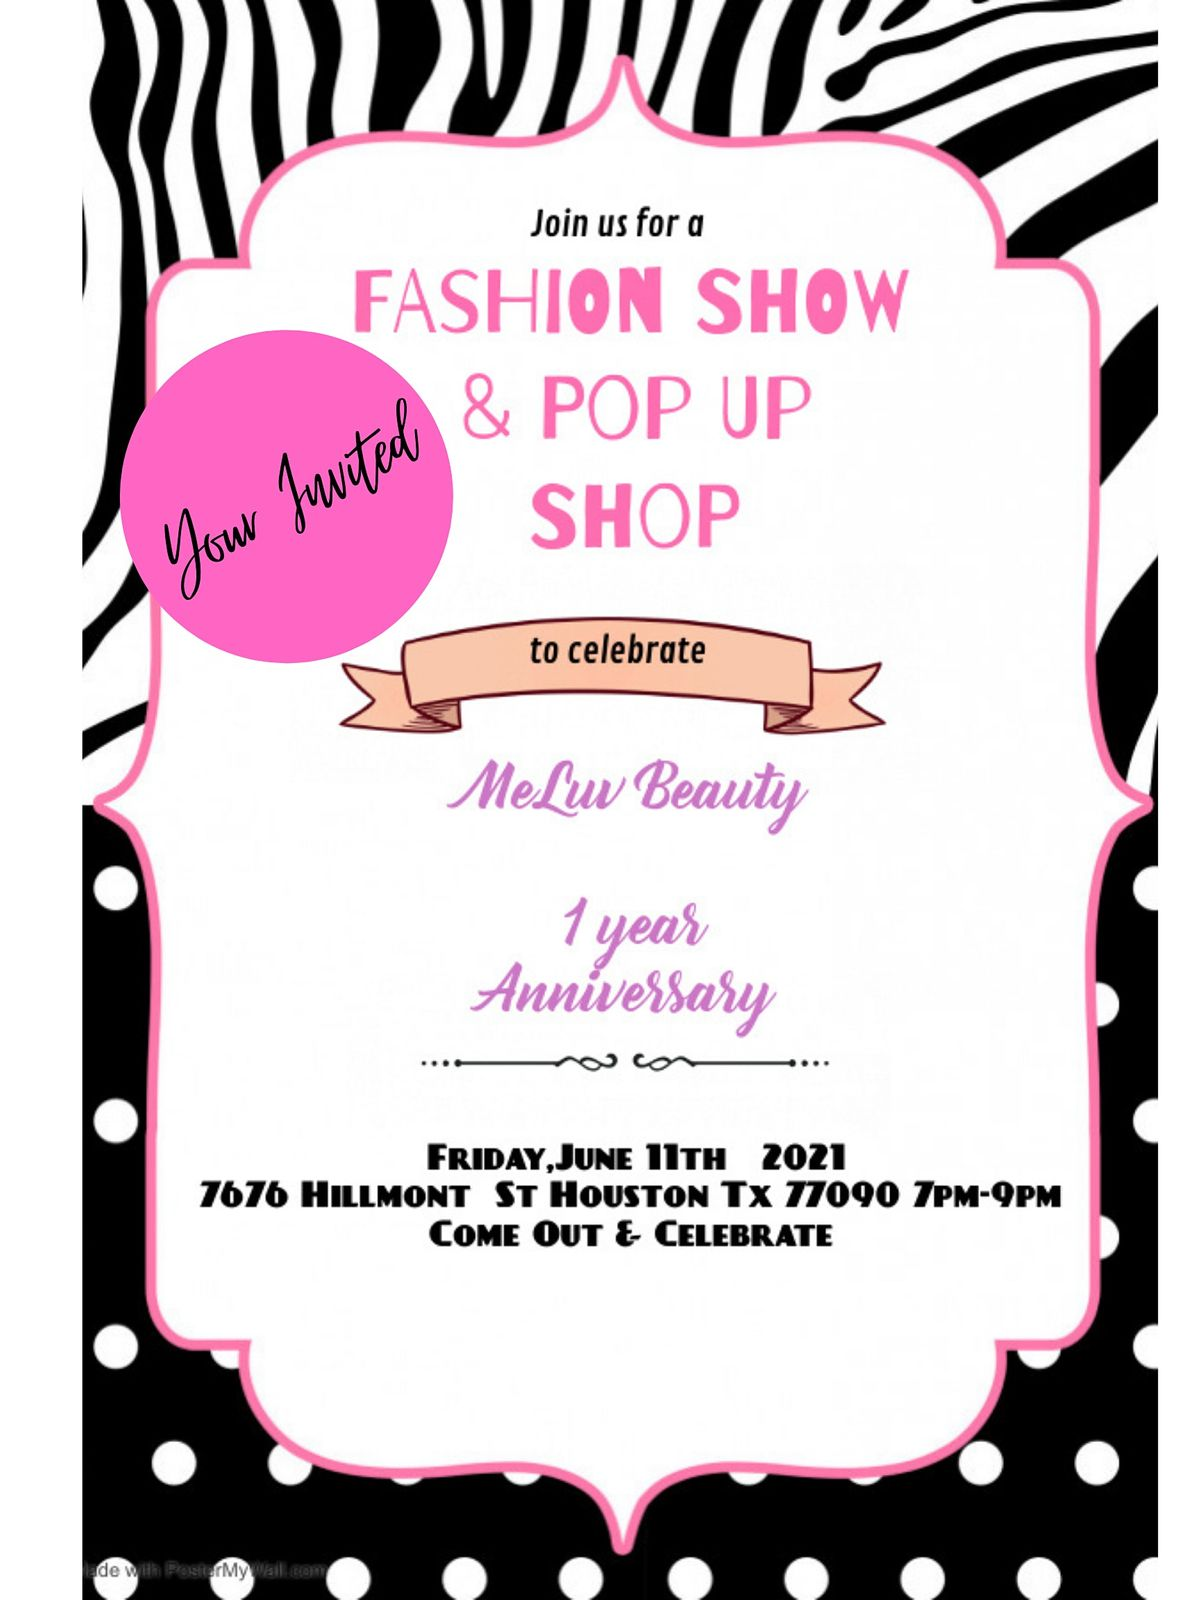 MeLuv Beauty Fashion Show